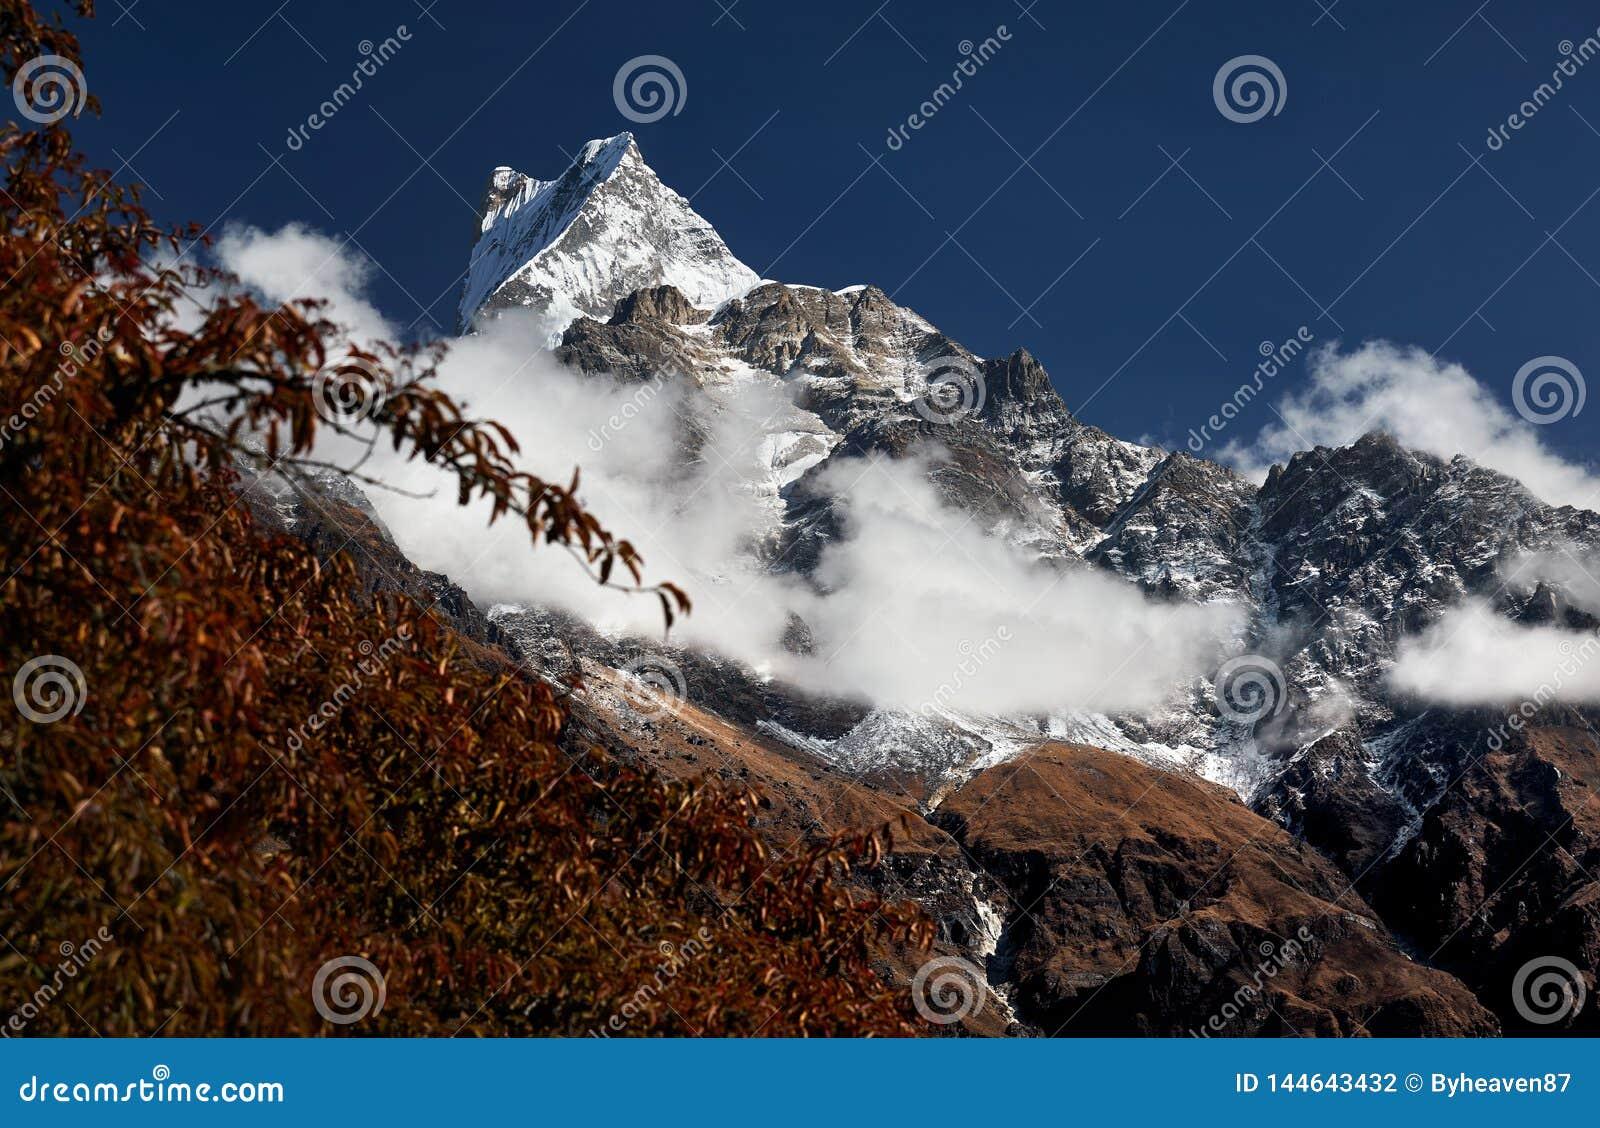 Snowy Peak in Himalayas